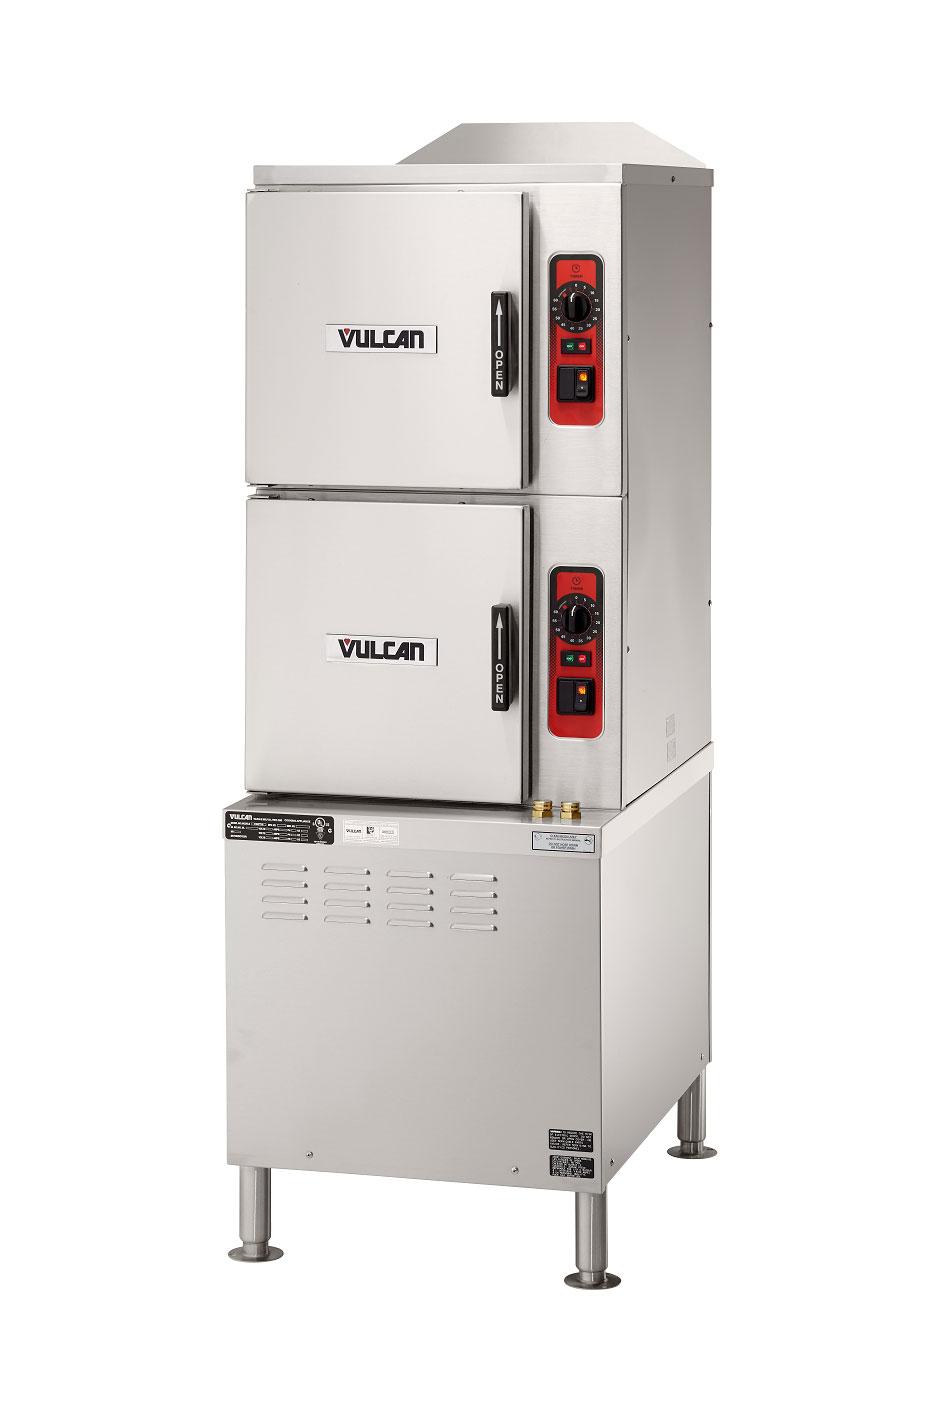 Vulcan C24ET10 steamer, convection, electric, floor model